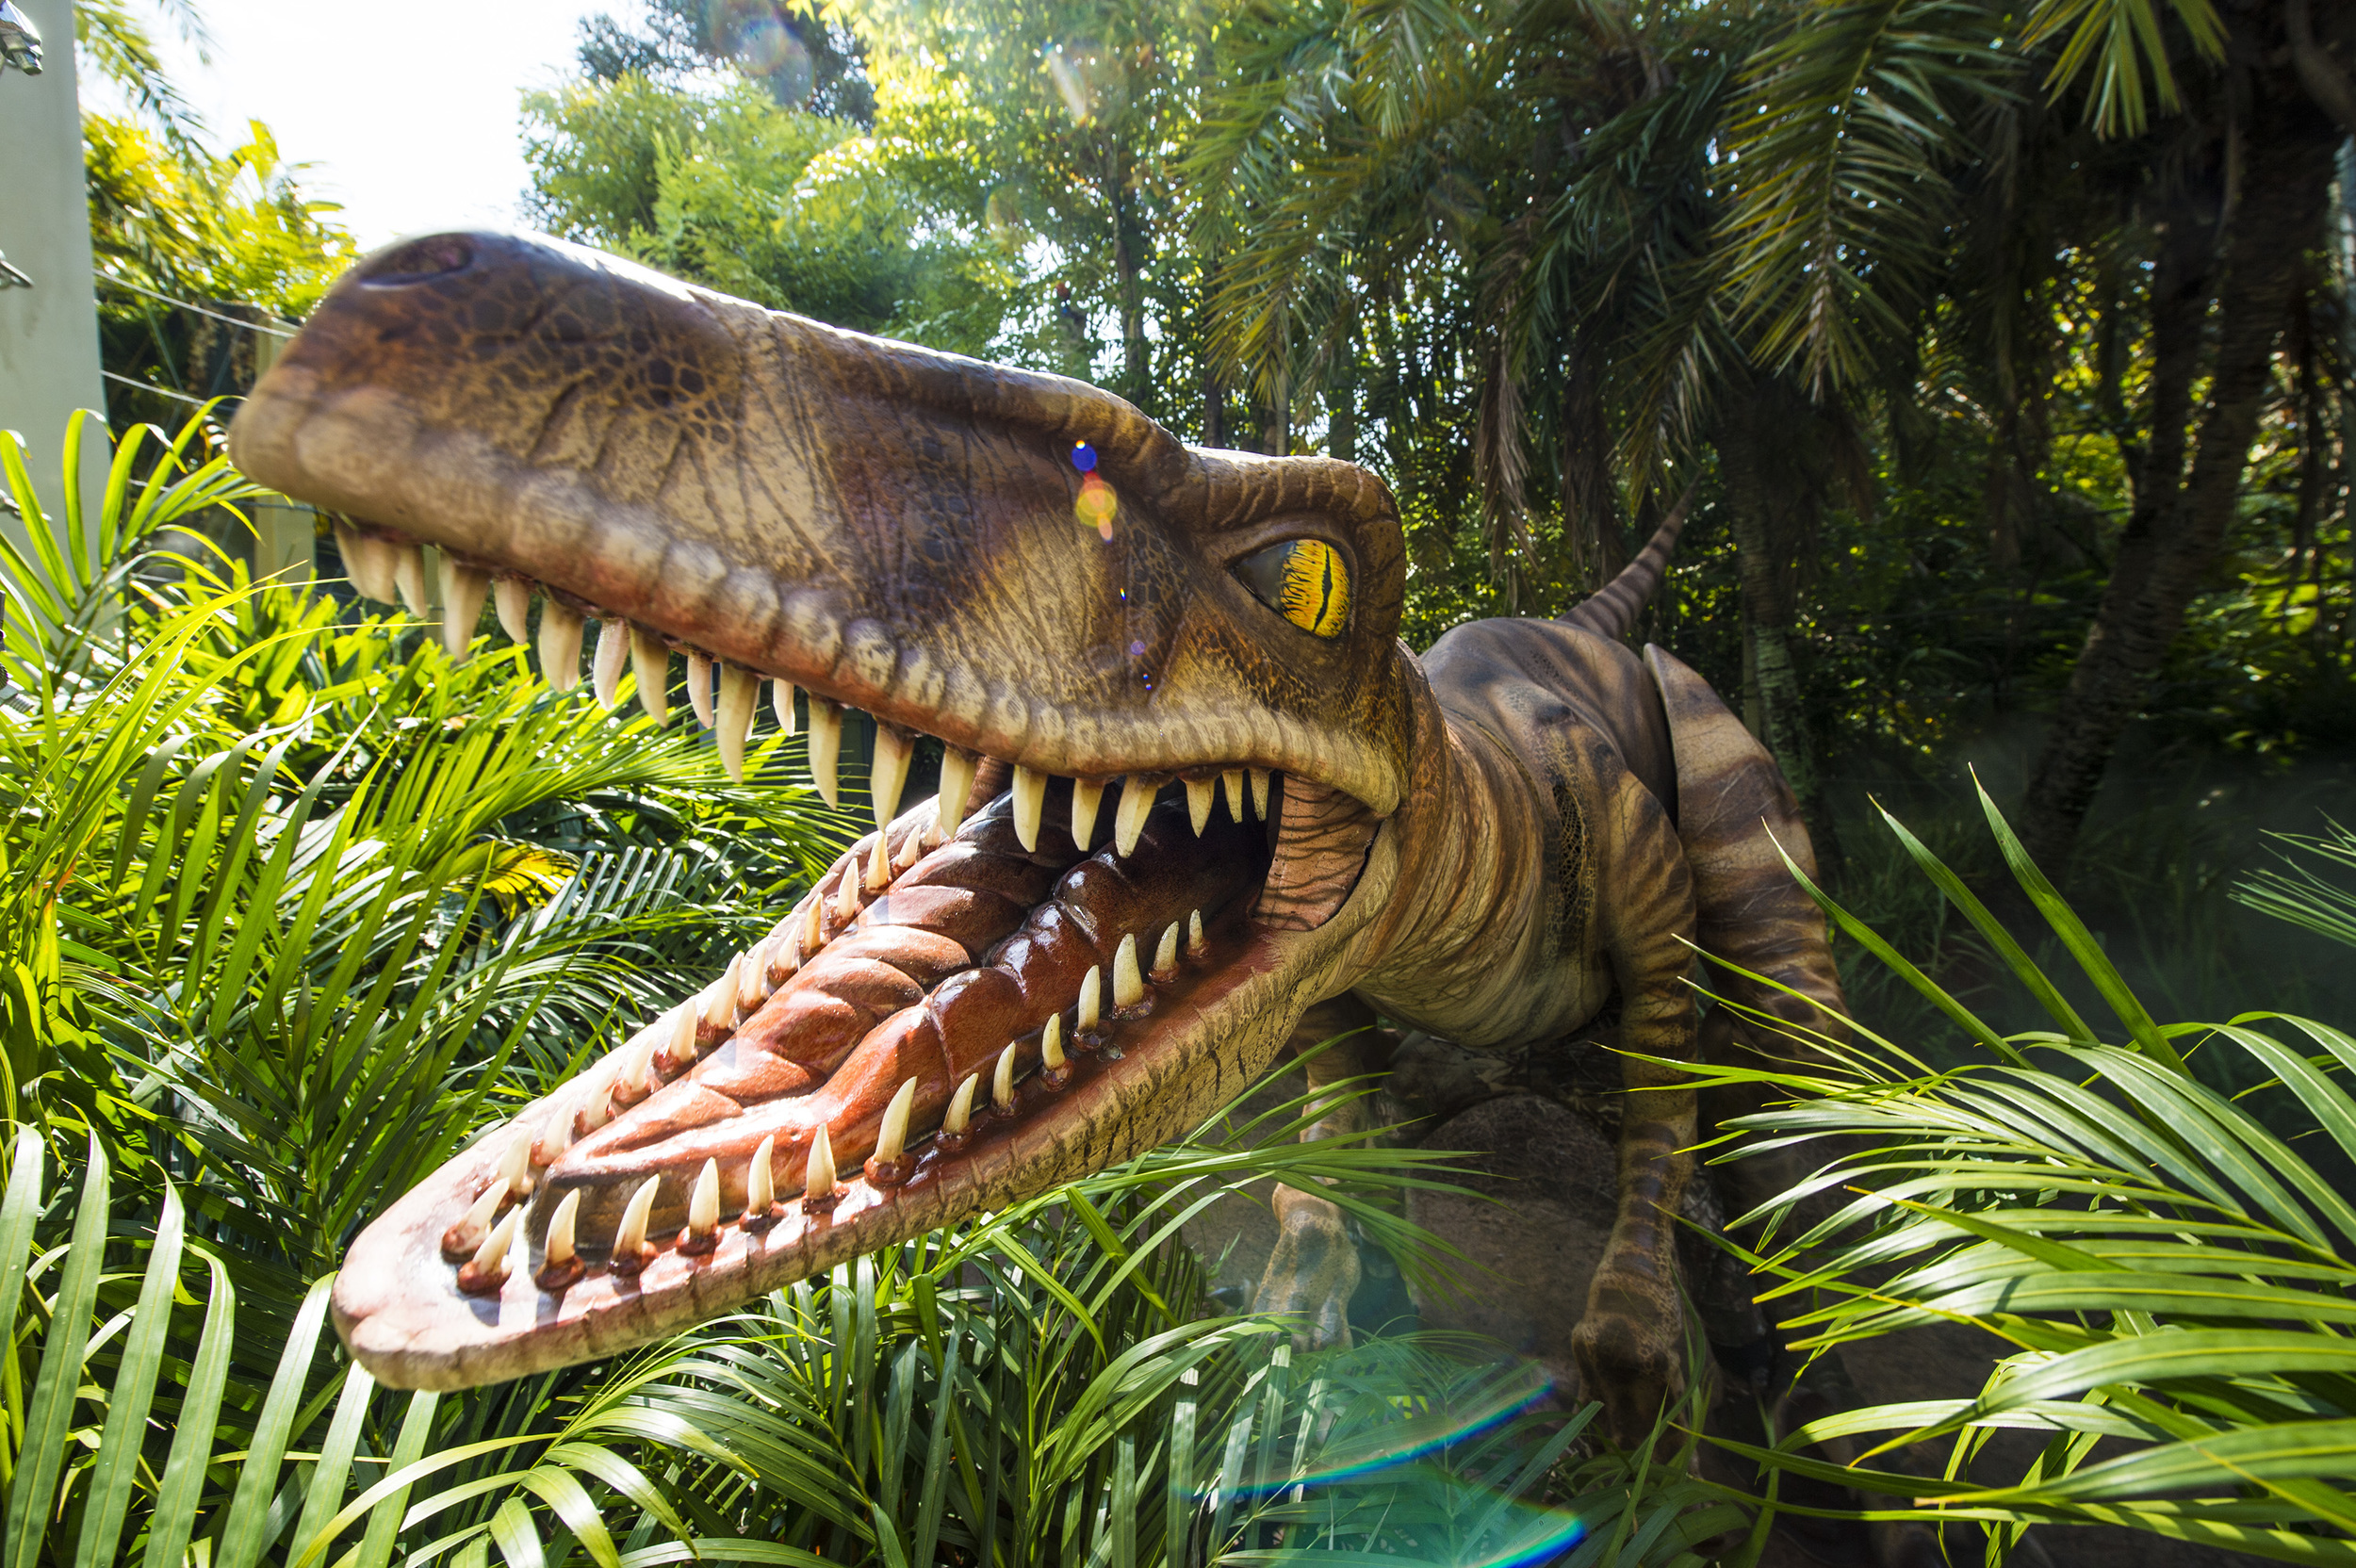 Raptor Encounter in Jurassic Park. Image credit: Universal Orlando Resort.